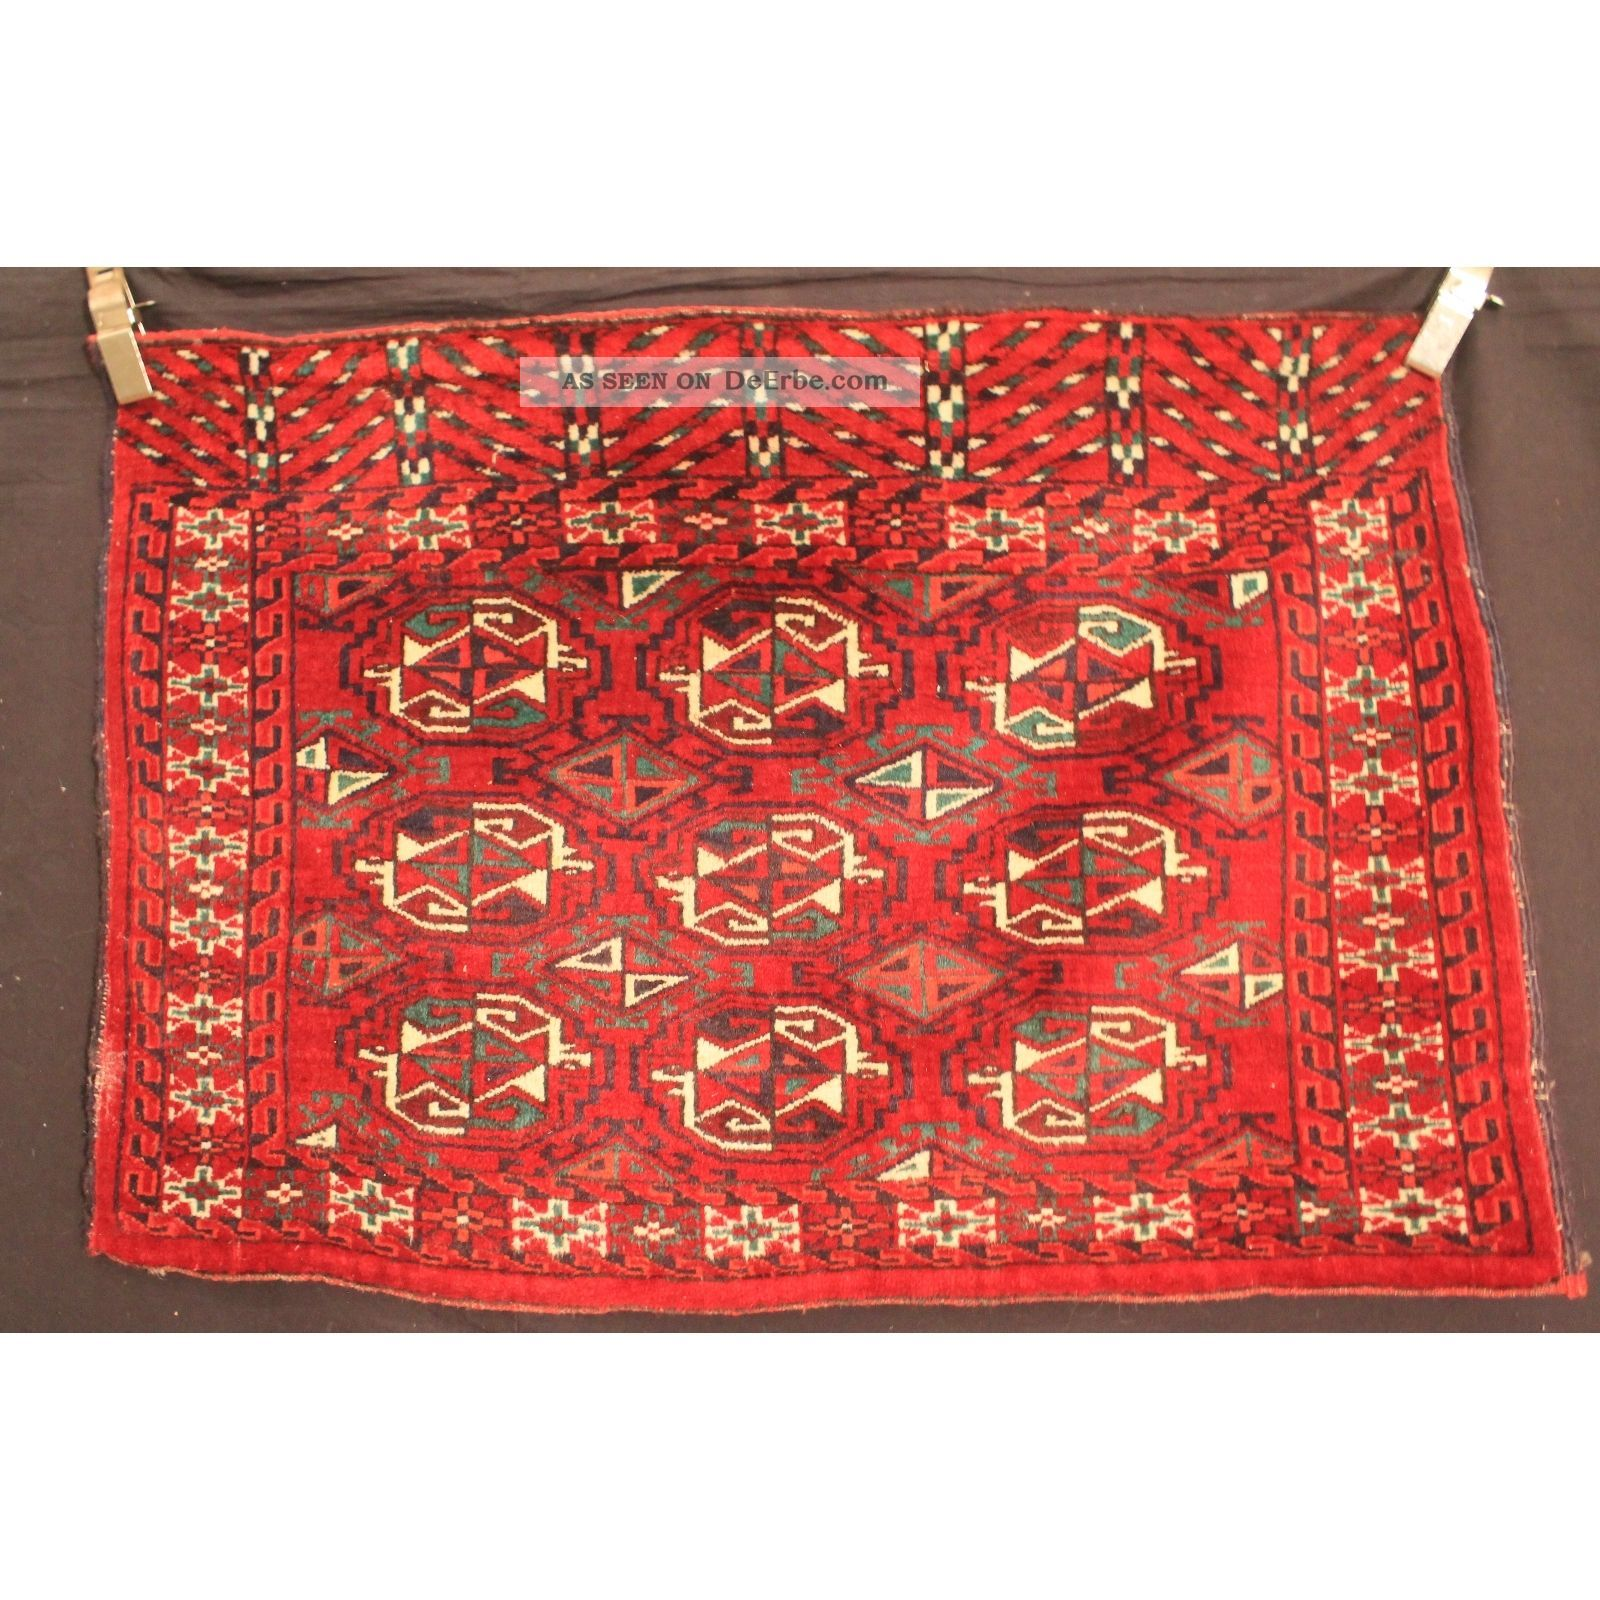 Antik Handgeknüpft Orient Teppich Udssr Turkman Jomut Old Rug Carpet 113x75cm Teppiche & Flachgewebe Bild